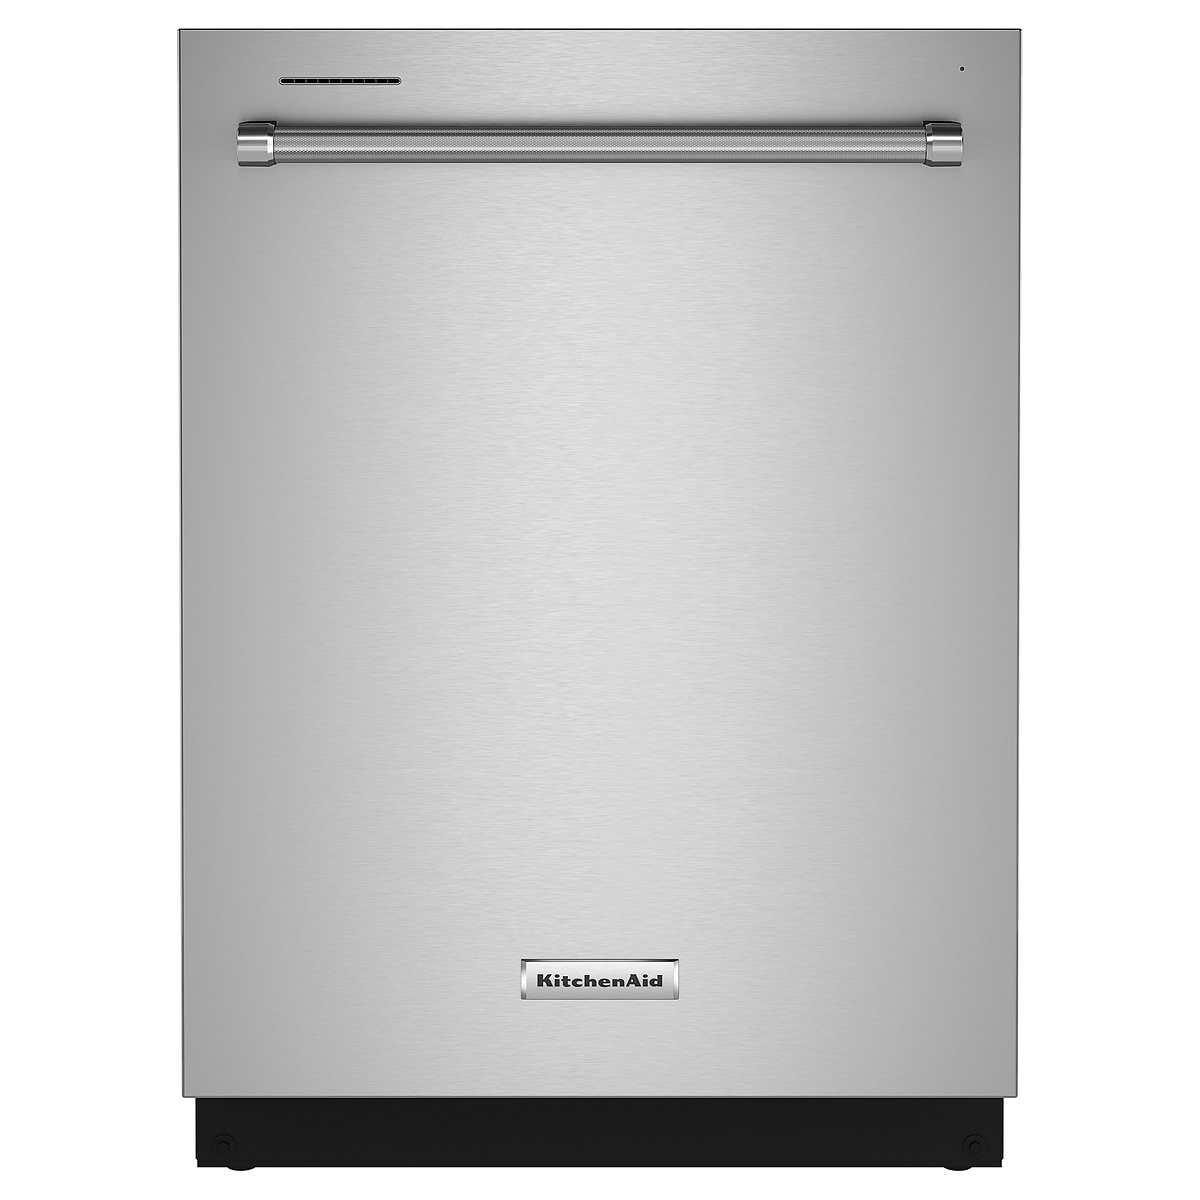 KitchenAid Hidden Control Dishwasher with FreeFlex Third Level Rack and  Express Wash Cycle